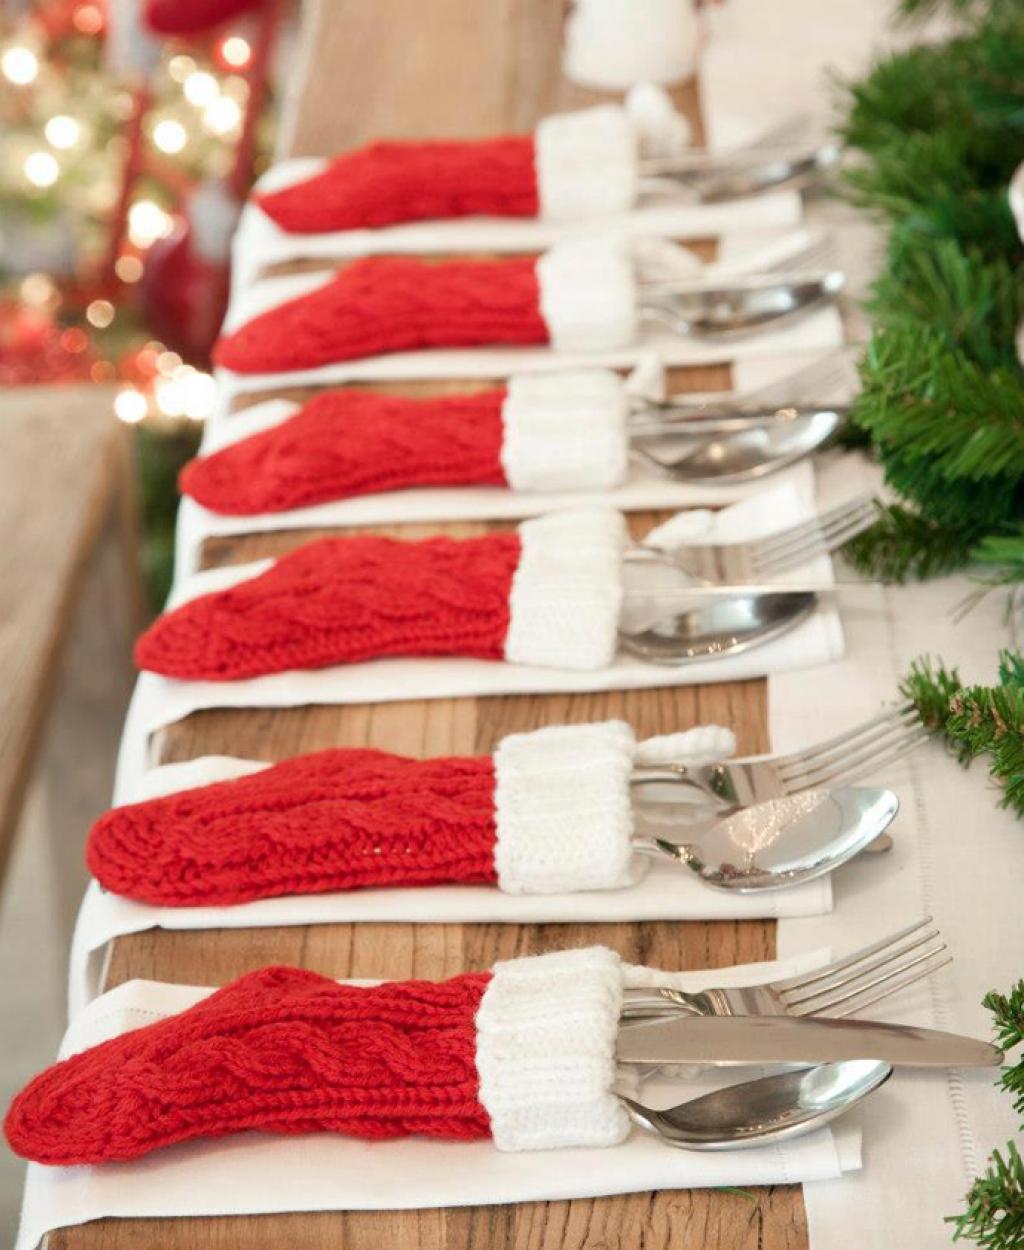 Easy Christmas Decor: Red Stocking Silverware Holders